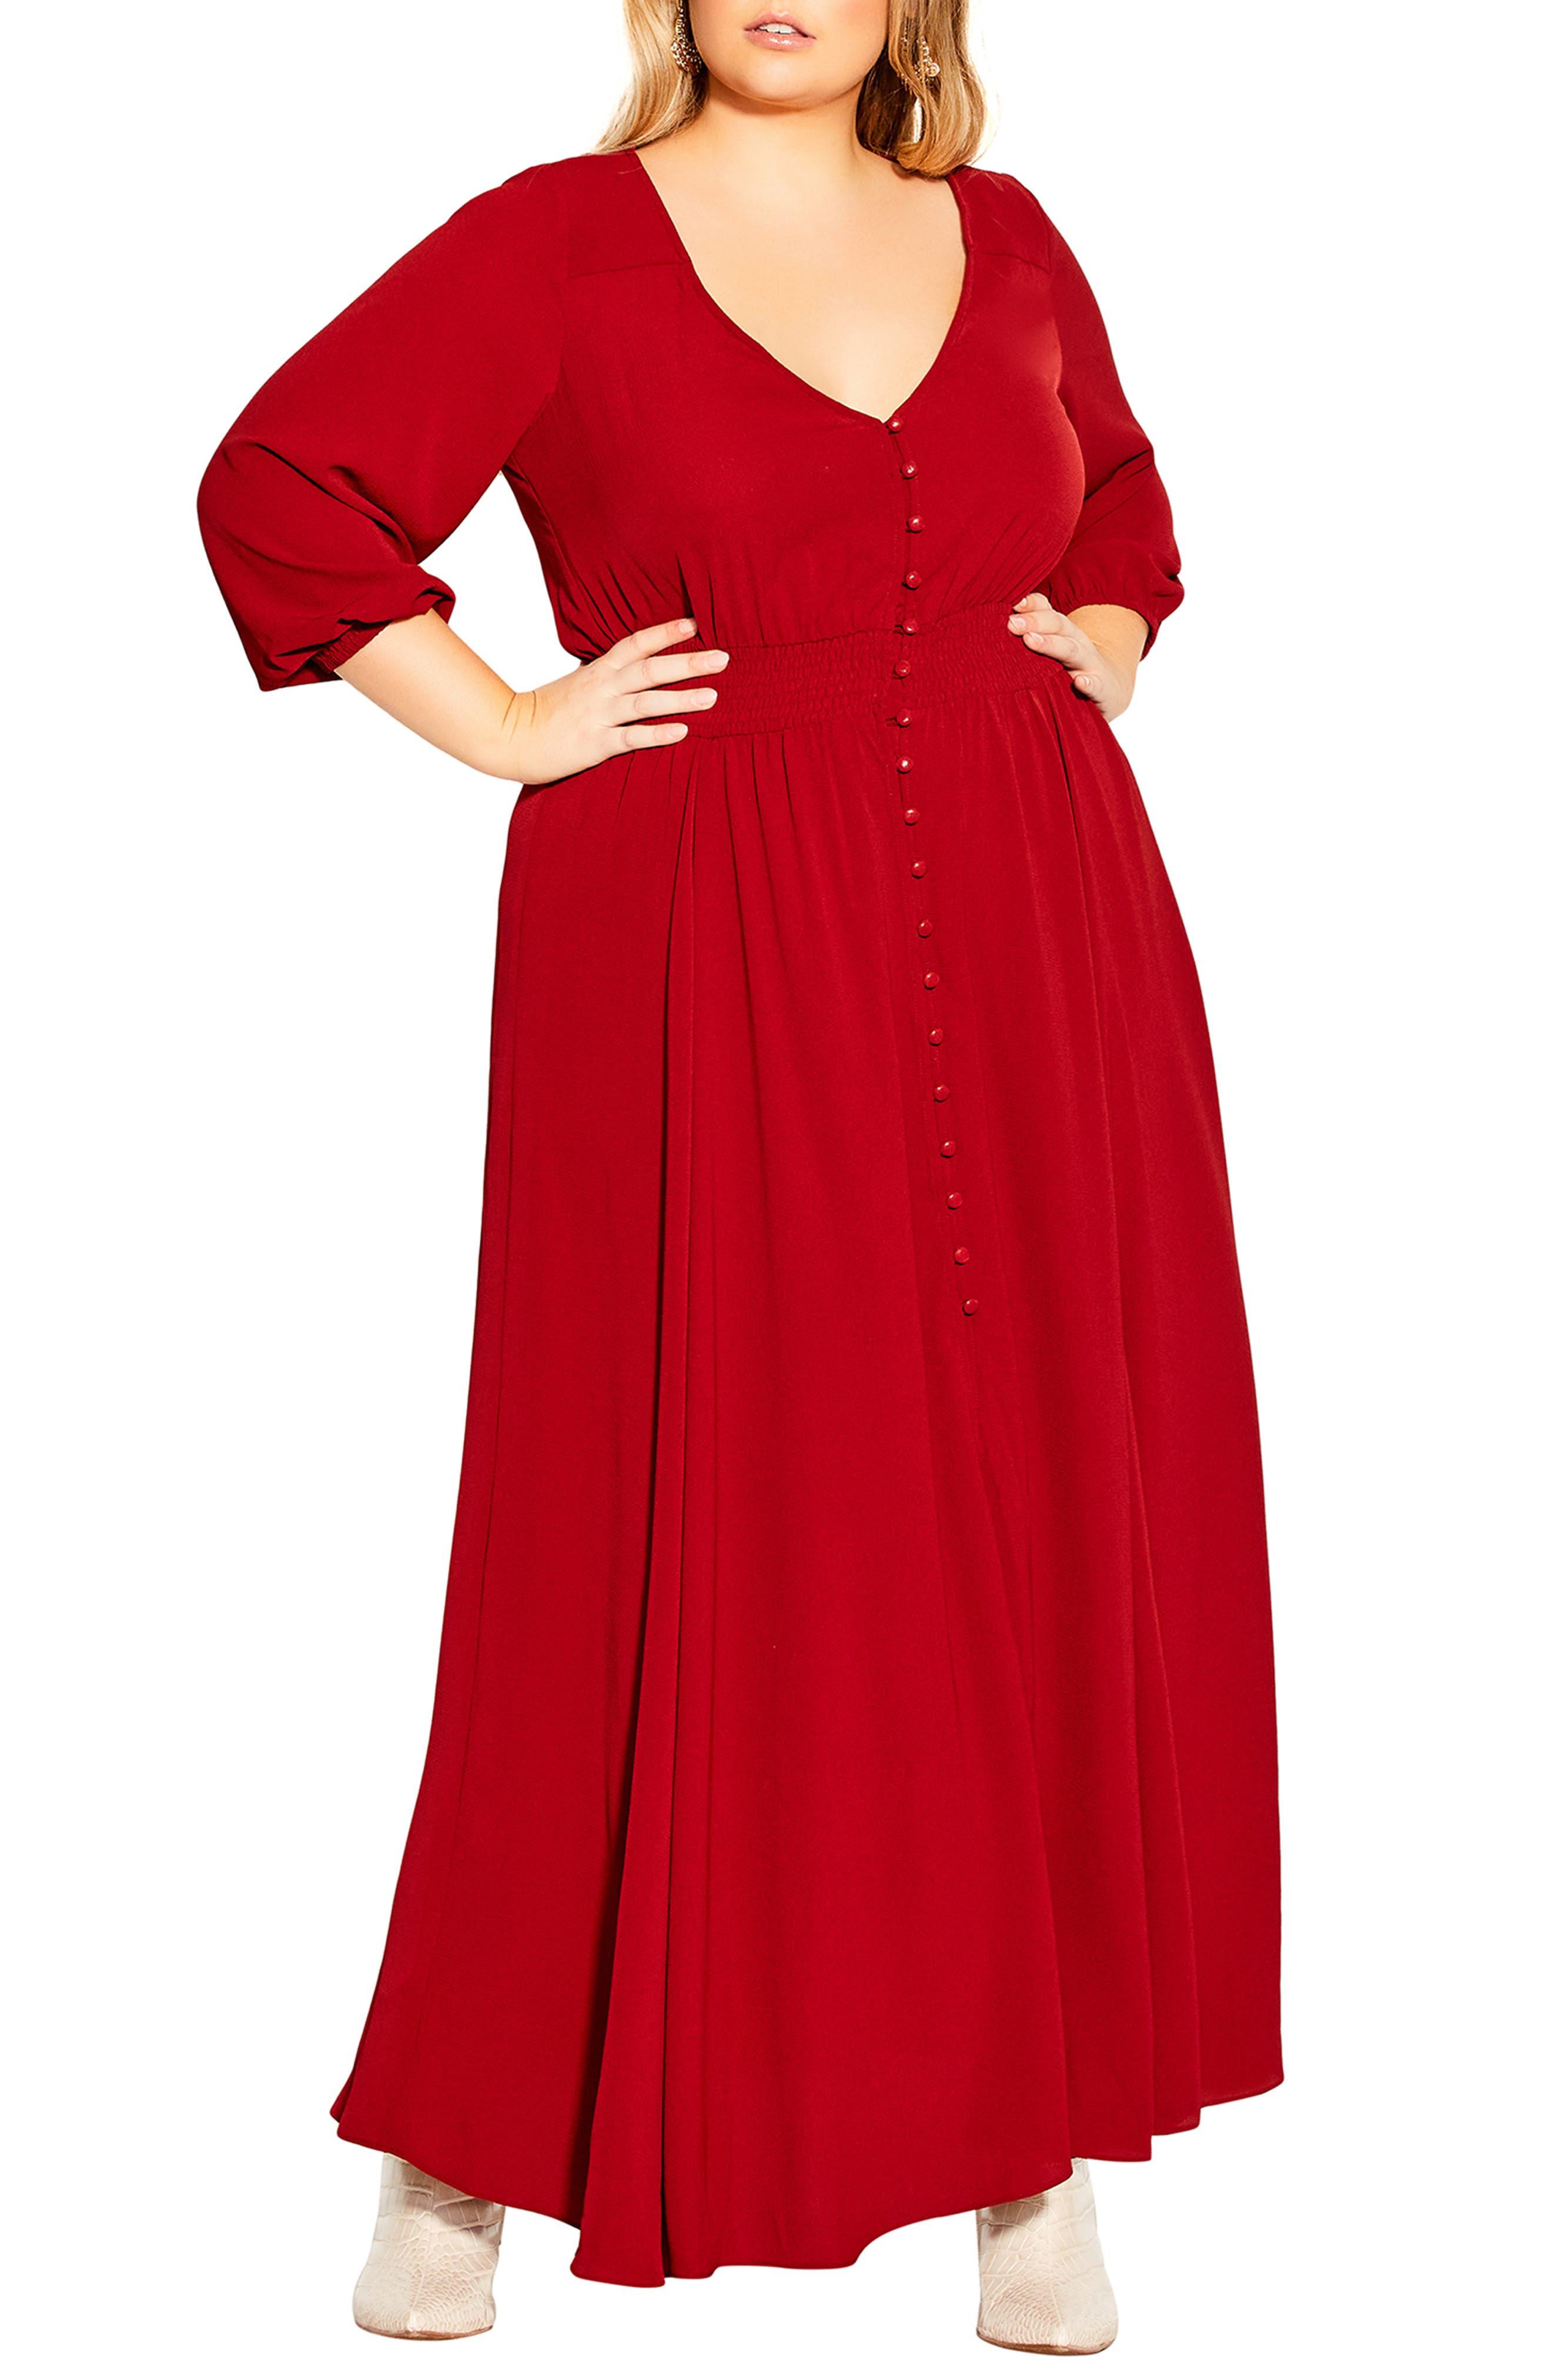 90s Blood Orange Layered Greek Waist Band Maxi Dress  Stretchy  Citi Dress  Size 8